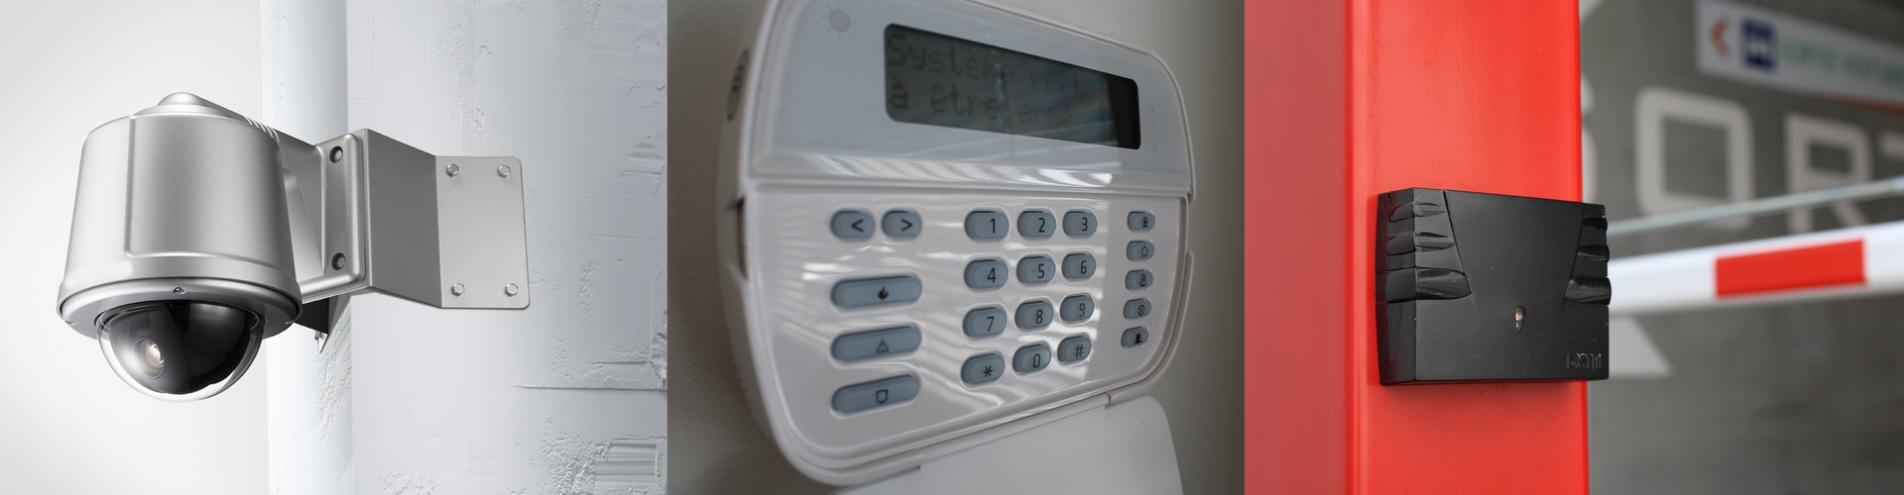 installateur intrusion controle acces vidéosurveilance